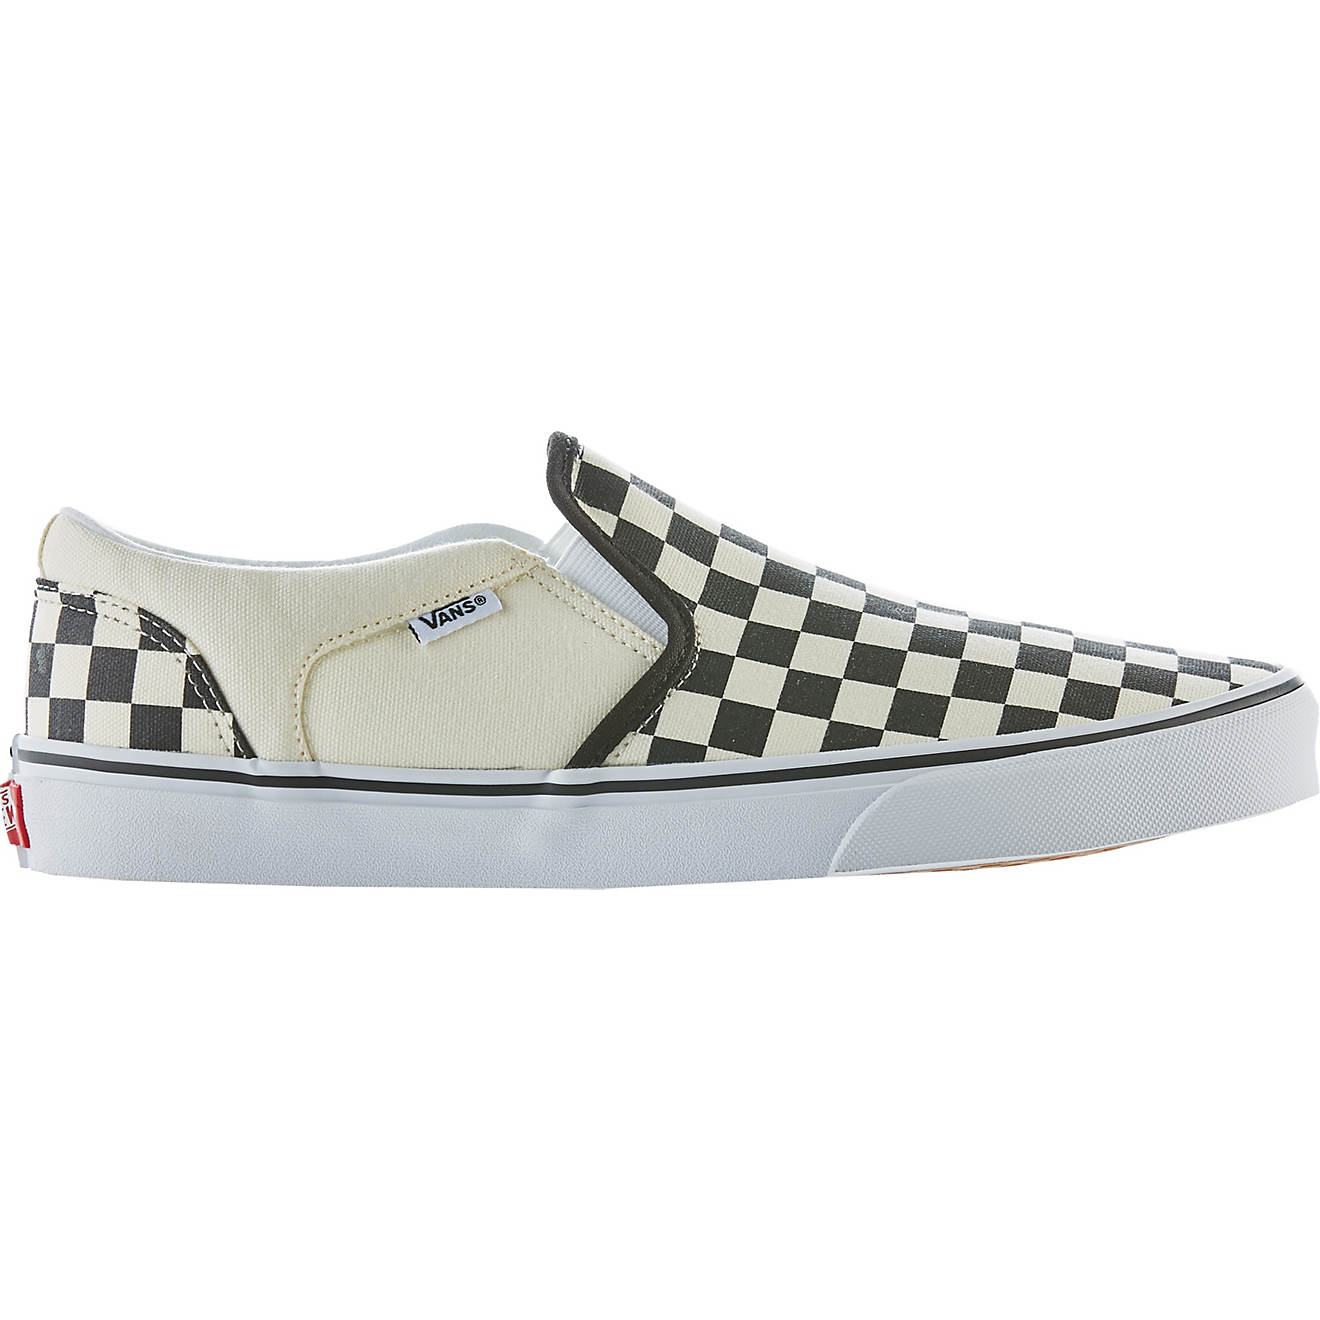 Vans Men's Asher Shoes